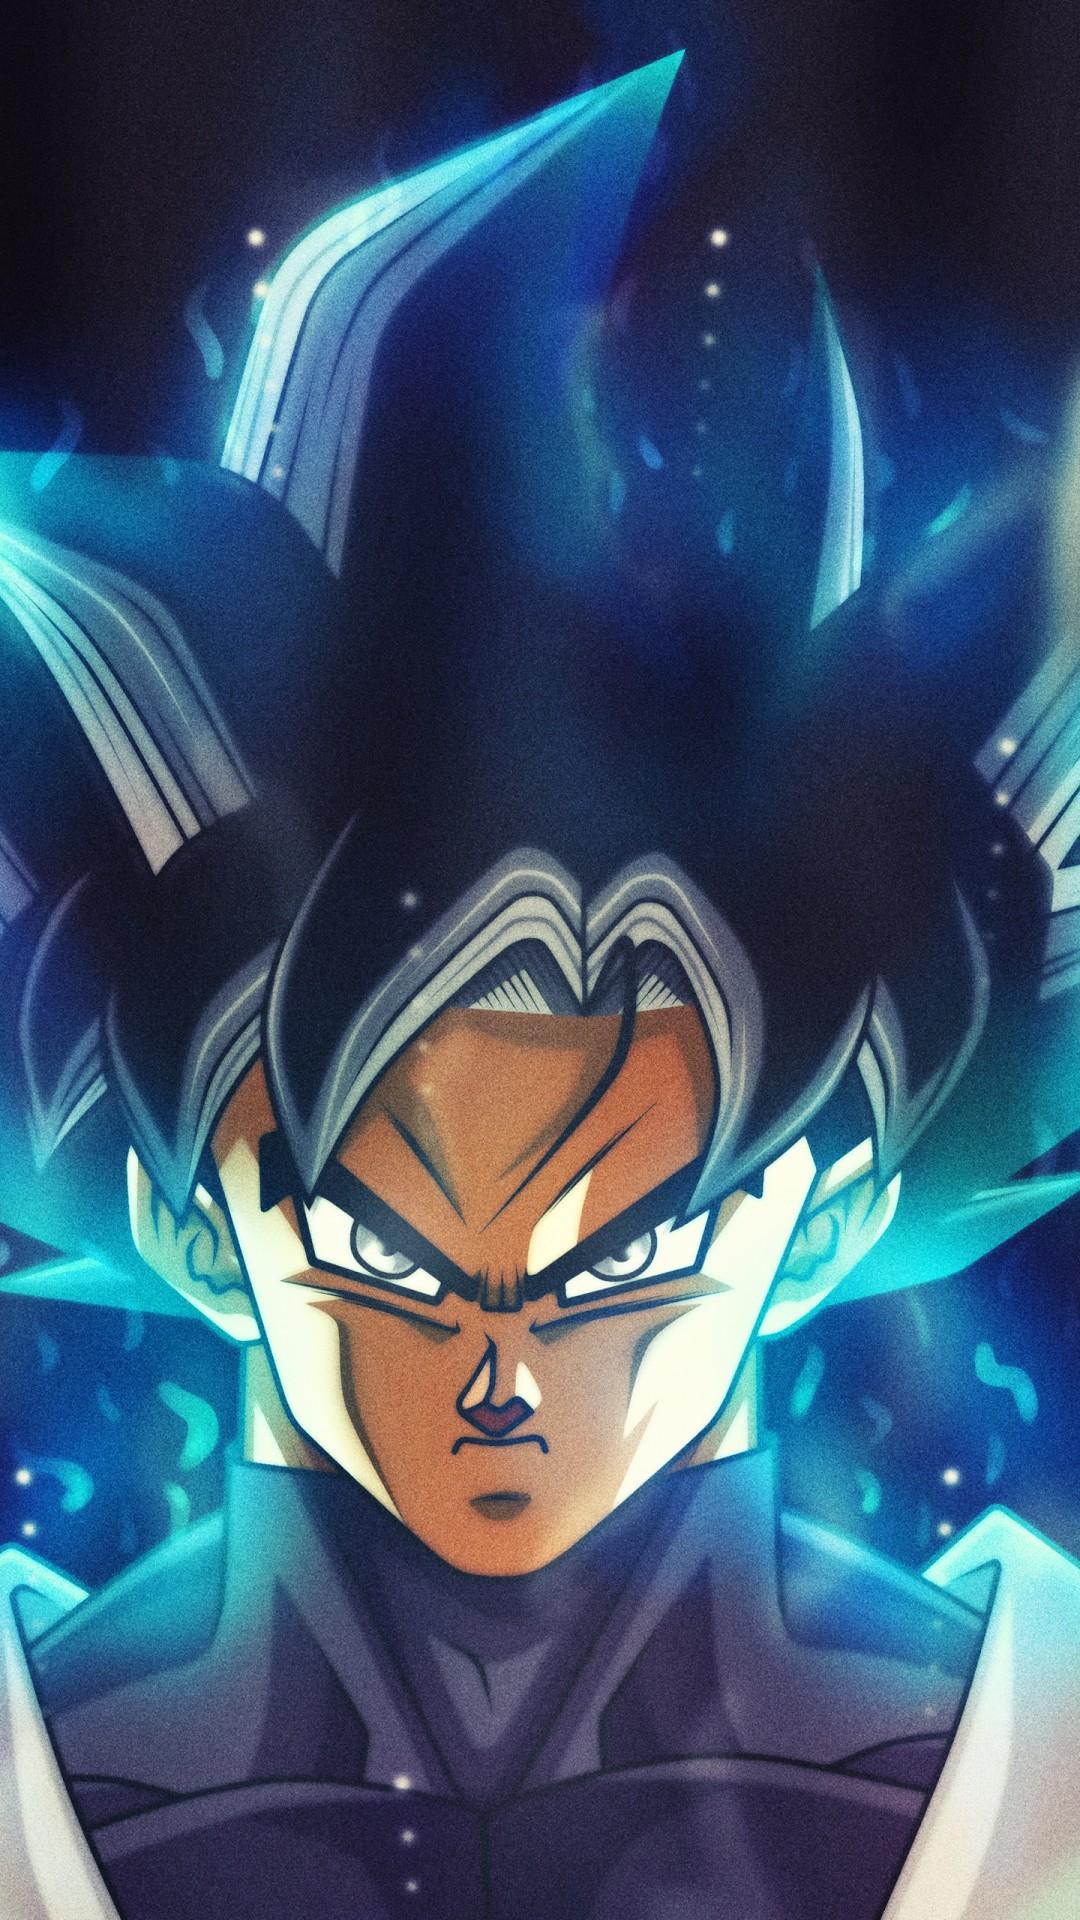 Goku Live Wallpaper Iphone 7 Plus Goku Wallpaper Iphone 7 Wallpaper Directory